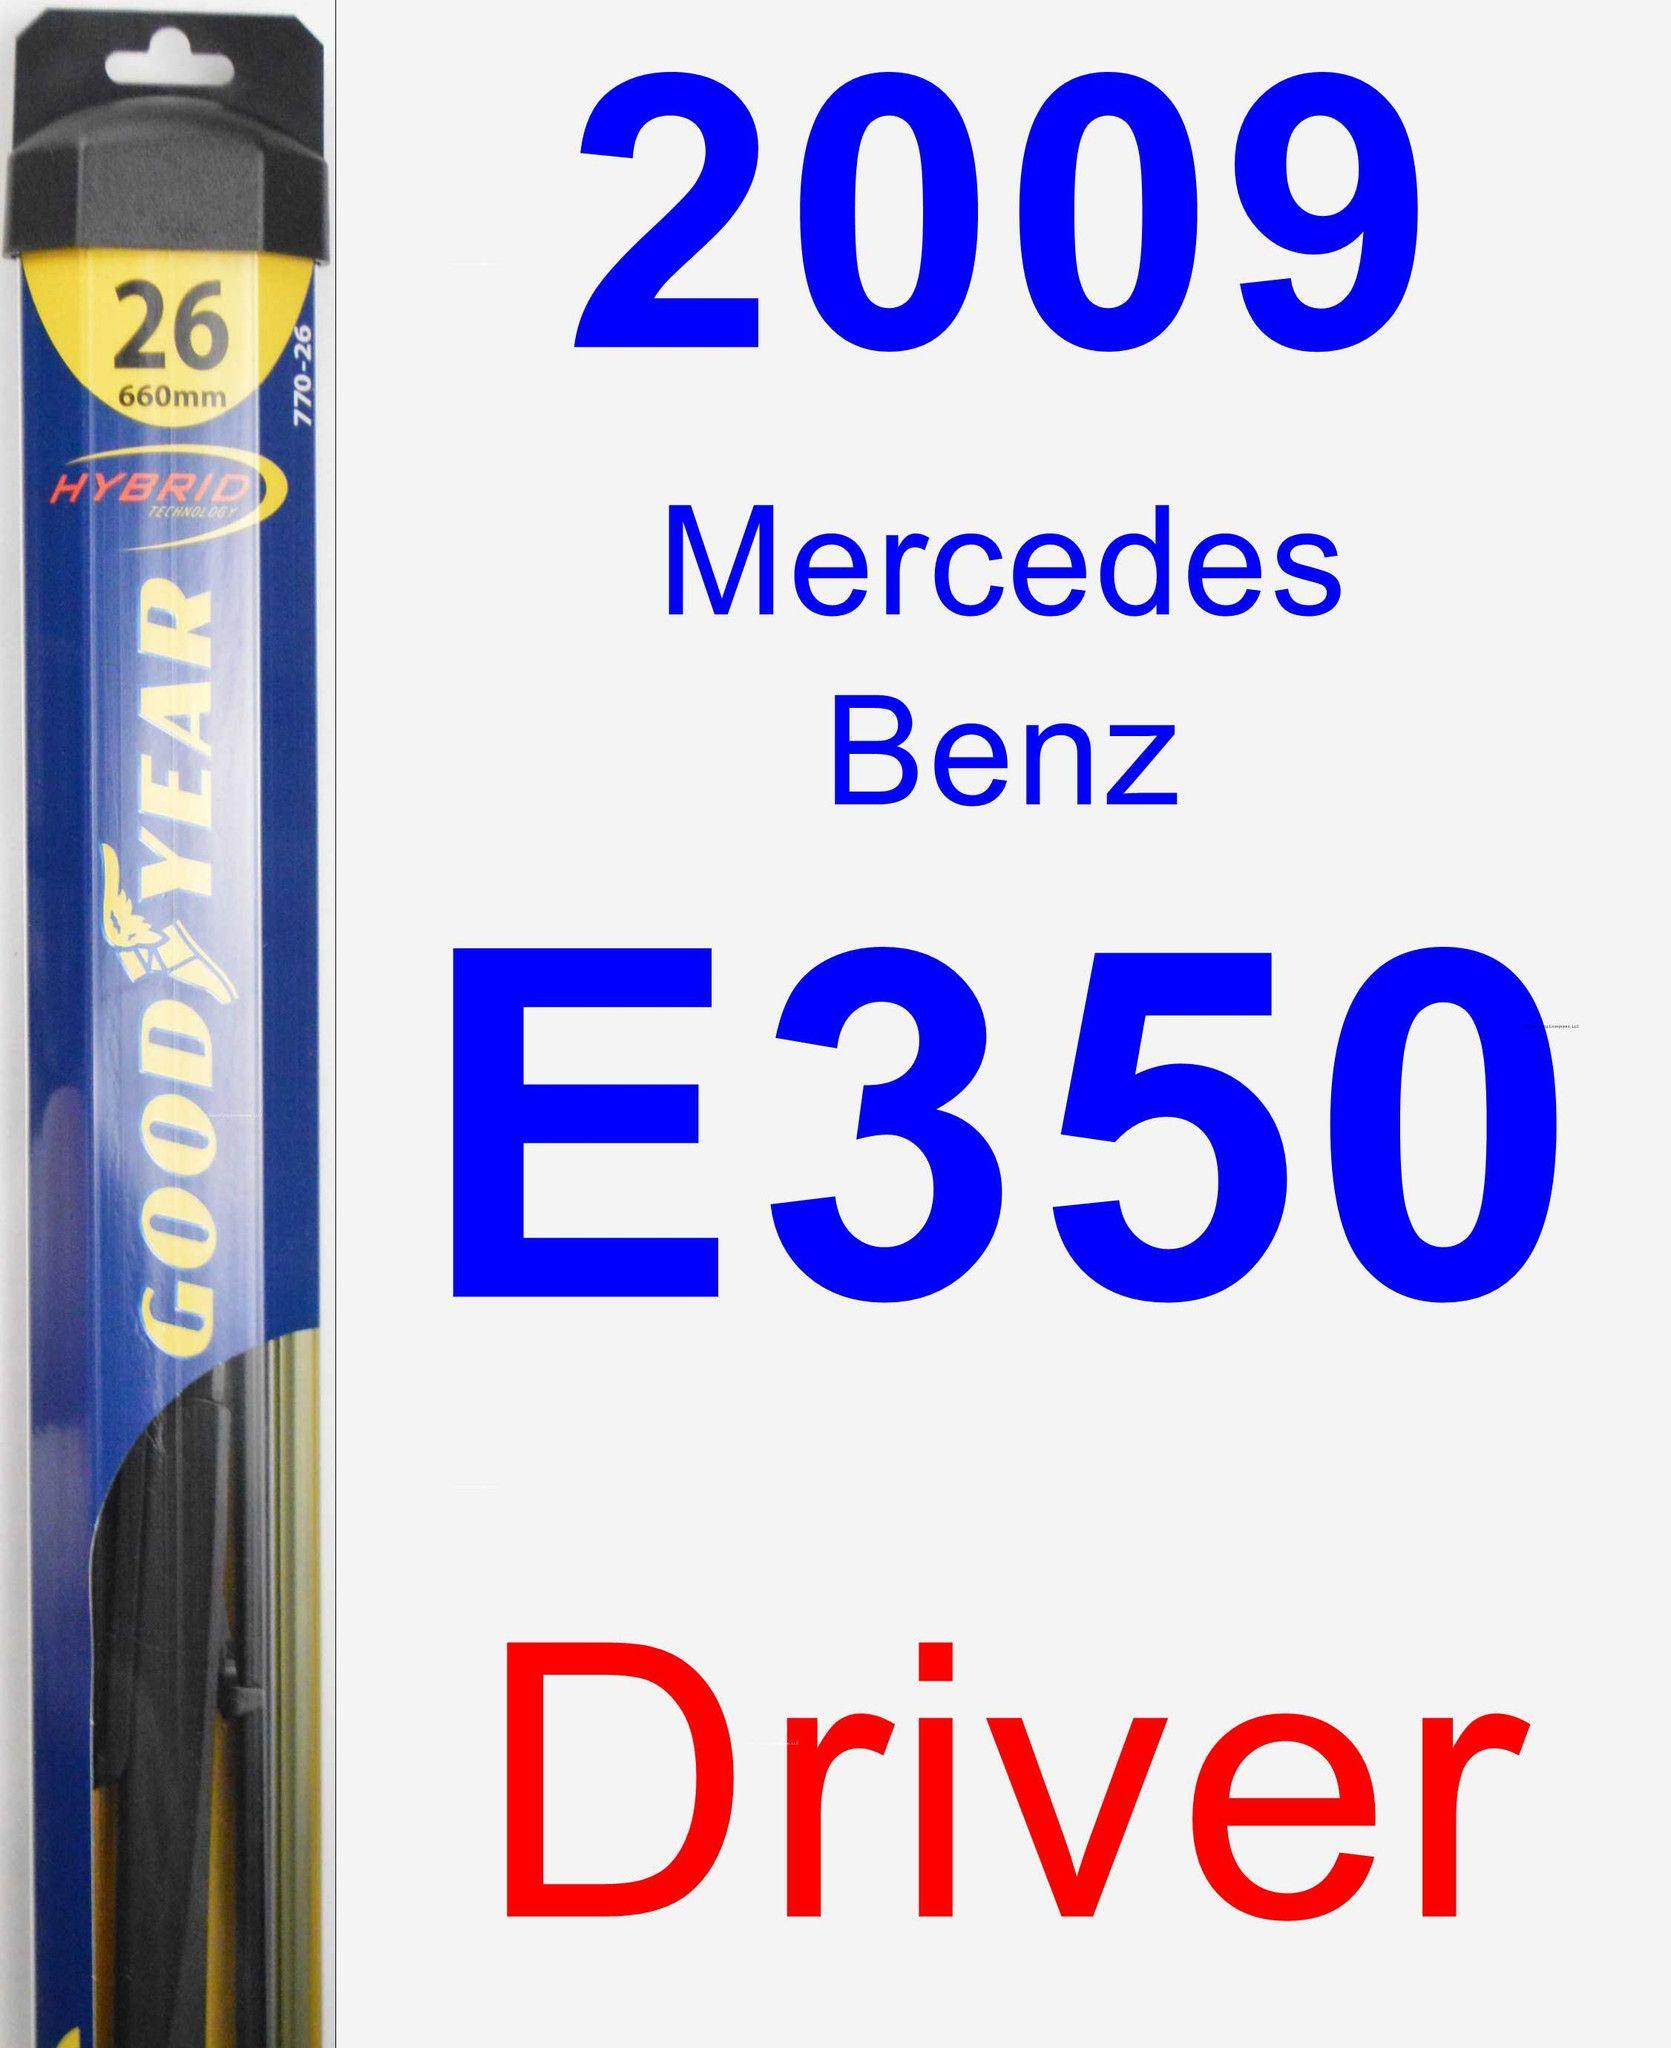 Driver Wiper Blade for 2009 MercedesBenz E350 Hybrid